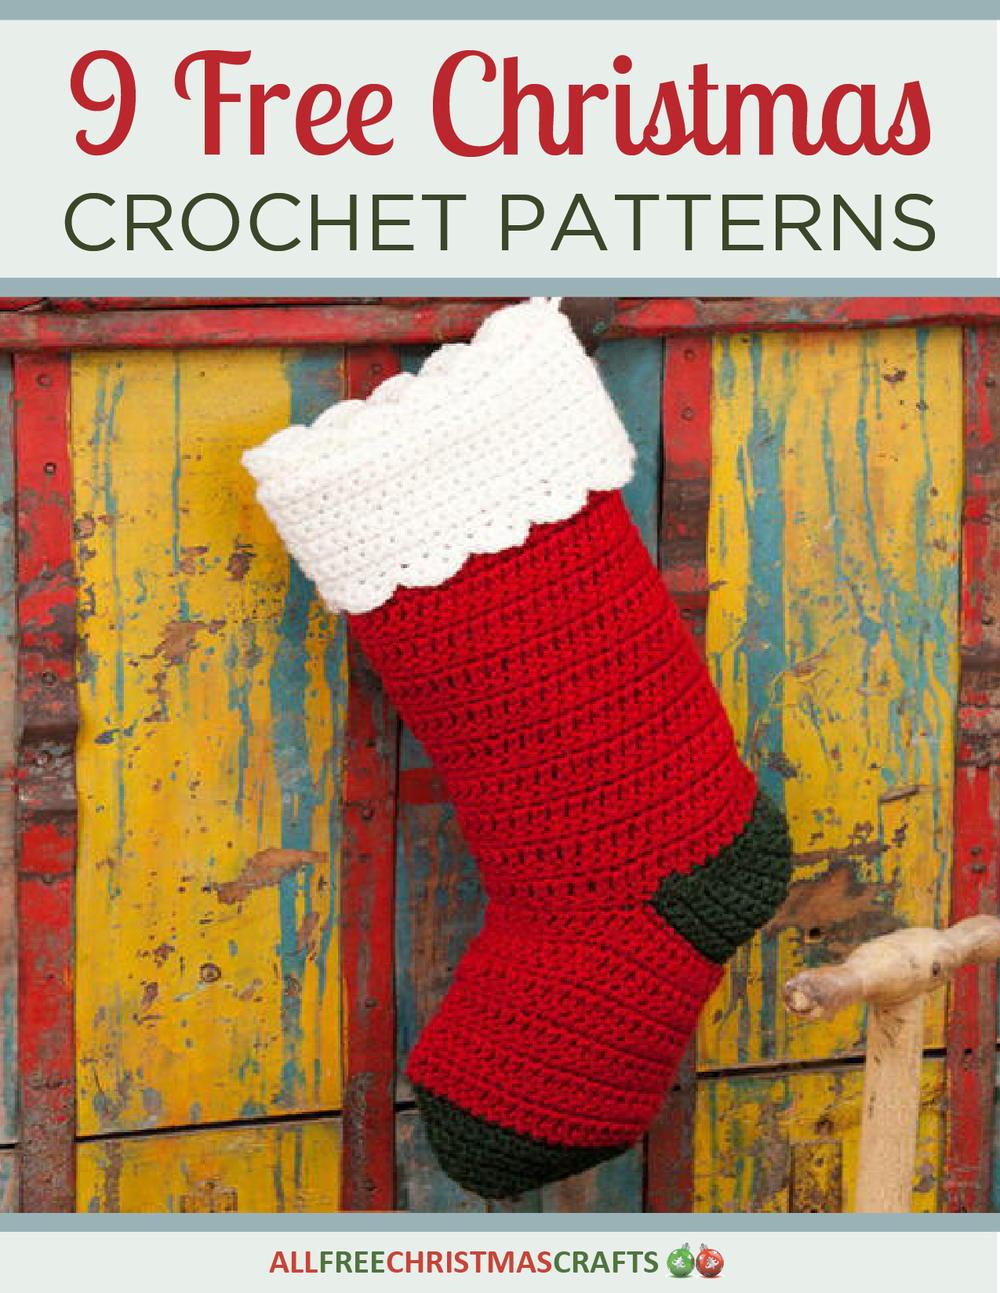 9 Free Christmas Crochet Patterns Free EBook